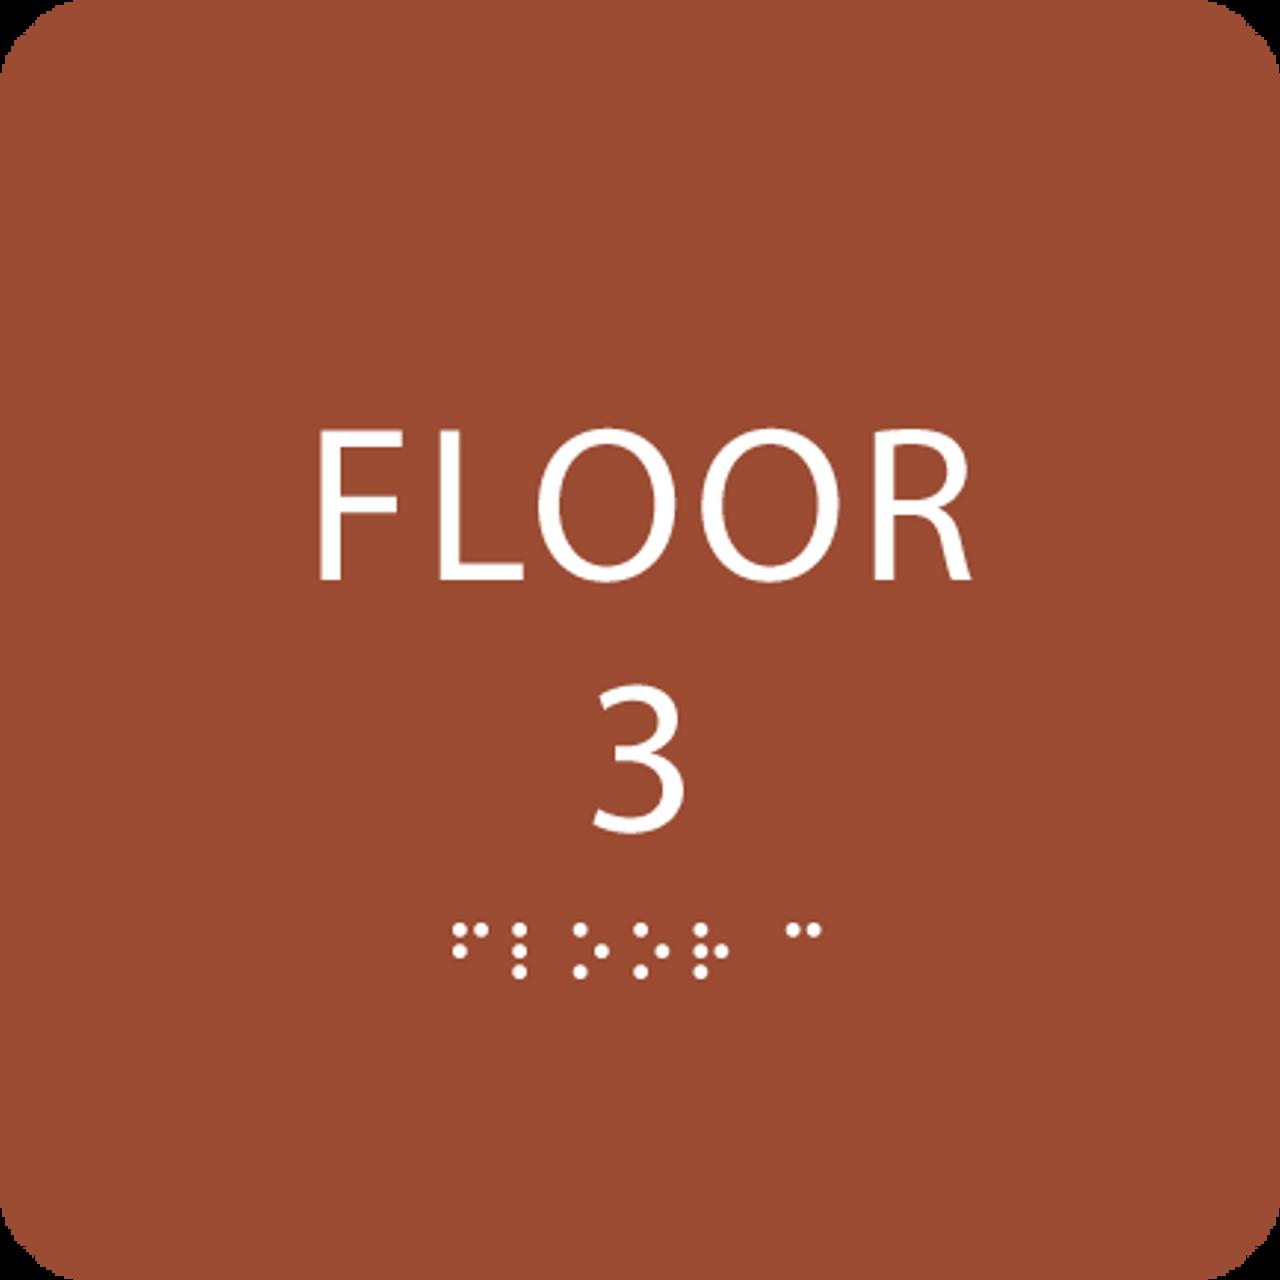 Orange Floor 3 Identification Sign